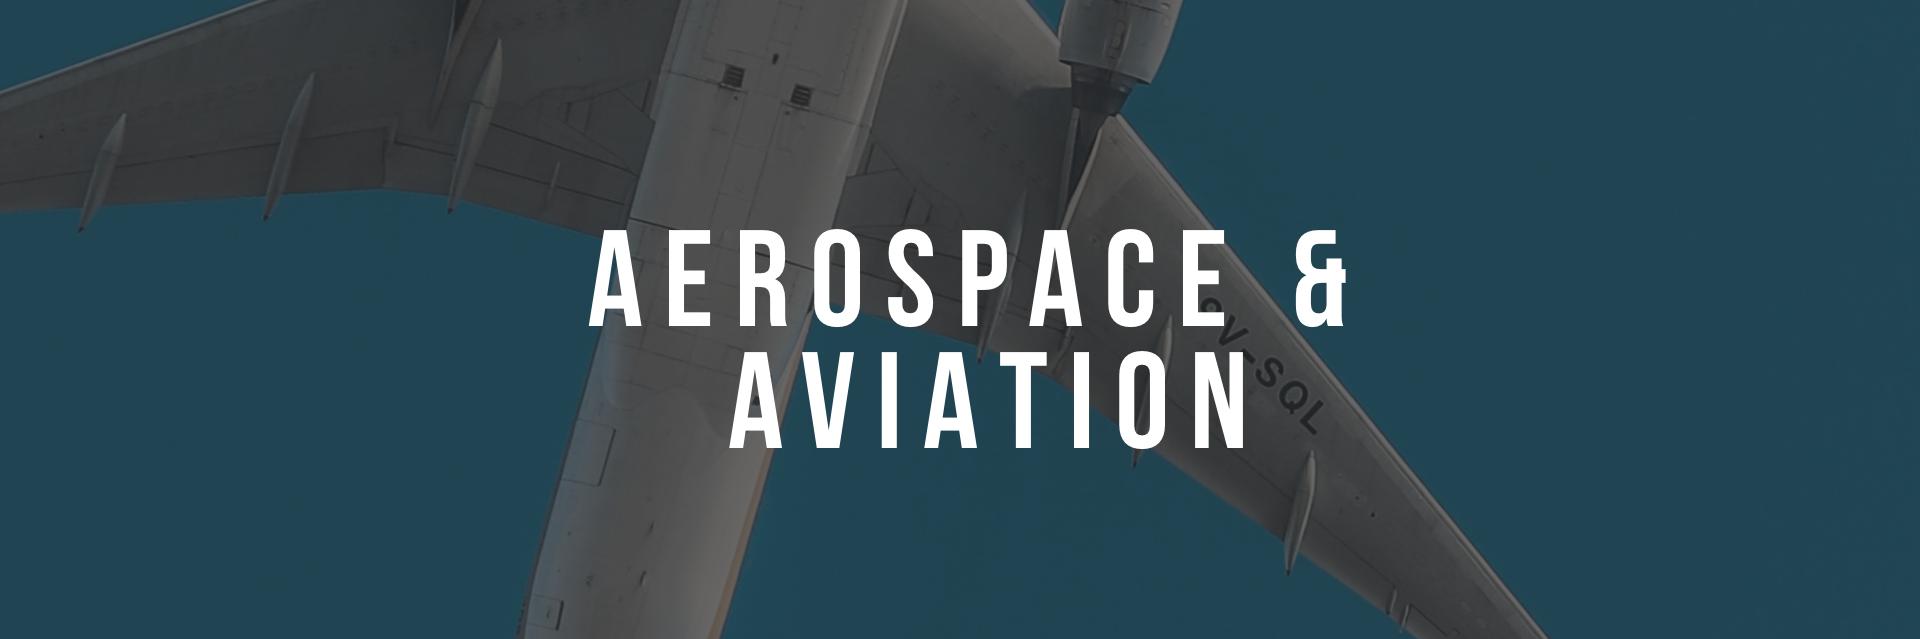 Aerospace & Aviation Recruitment Specialists